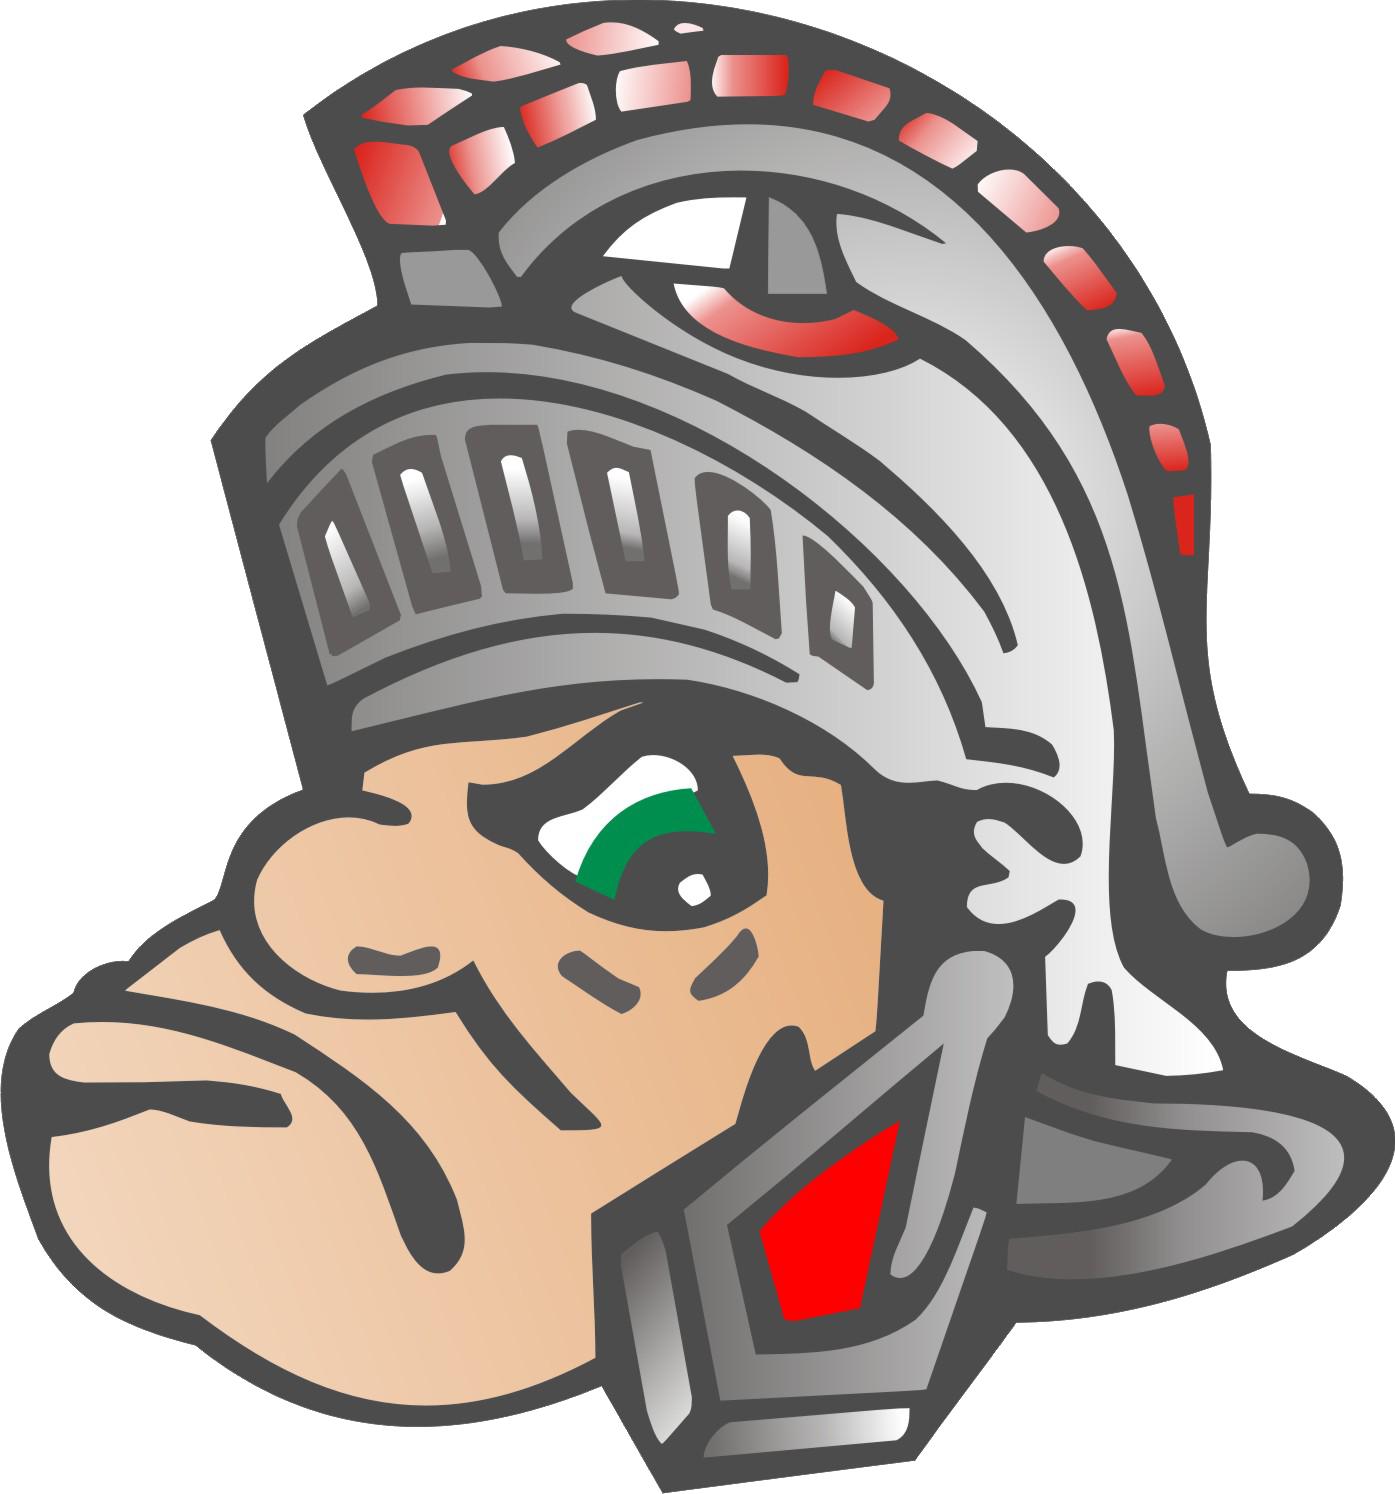 Spartan clipart wins. Lima senior team home